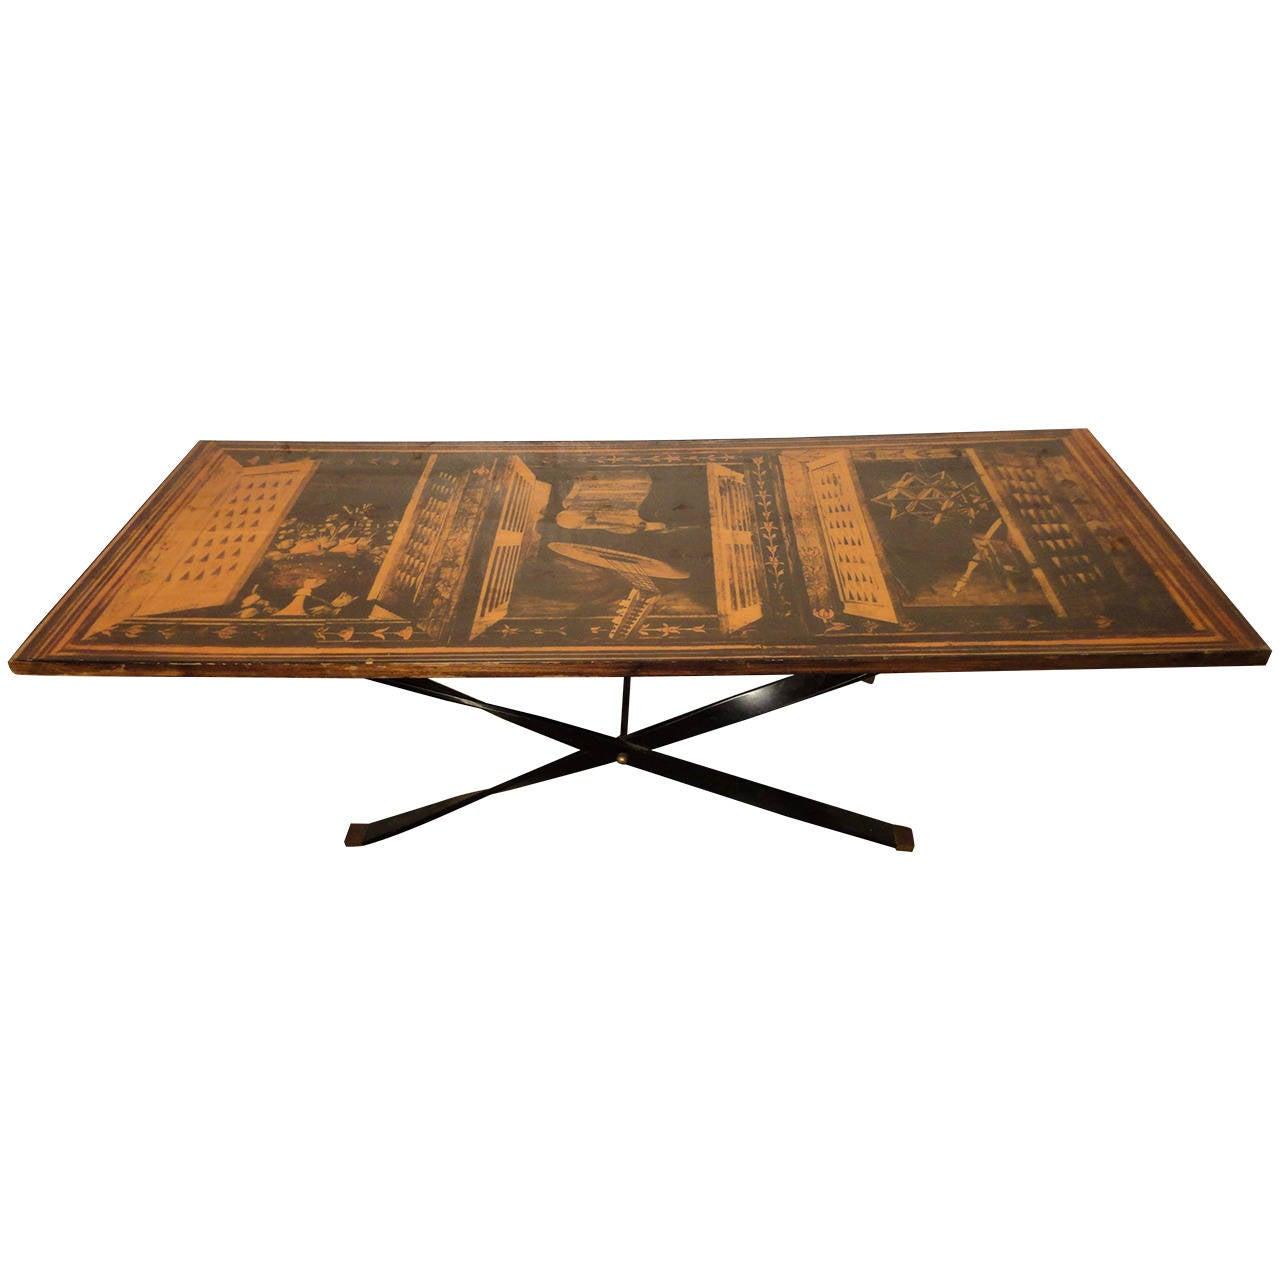 Beautiful Modern Coffee Tables: Mid-Century Modern Coffee Table With Beautiful Laminate